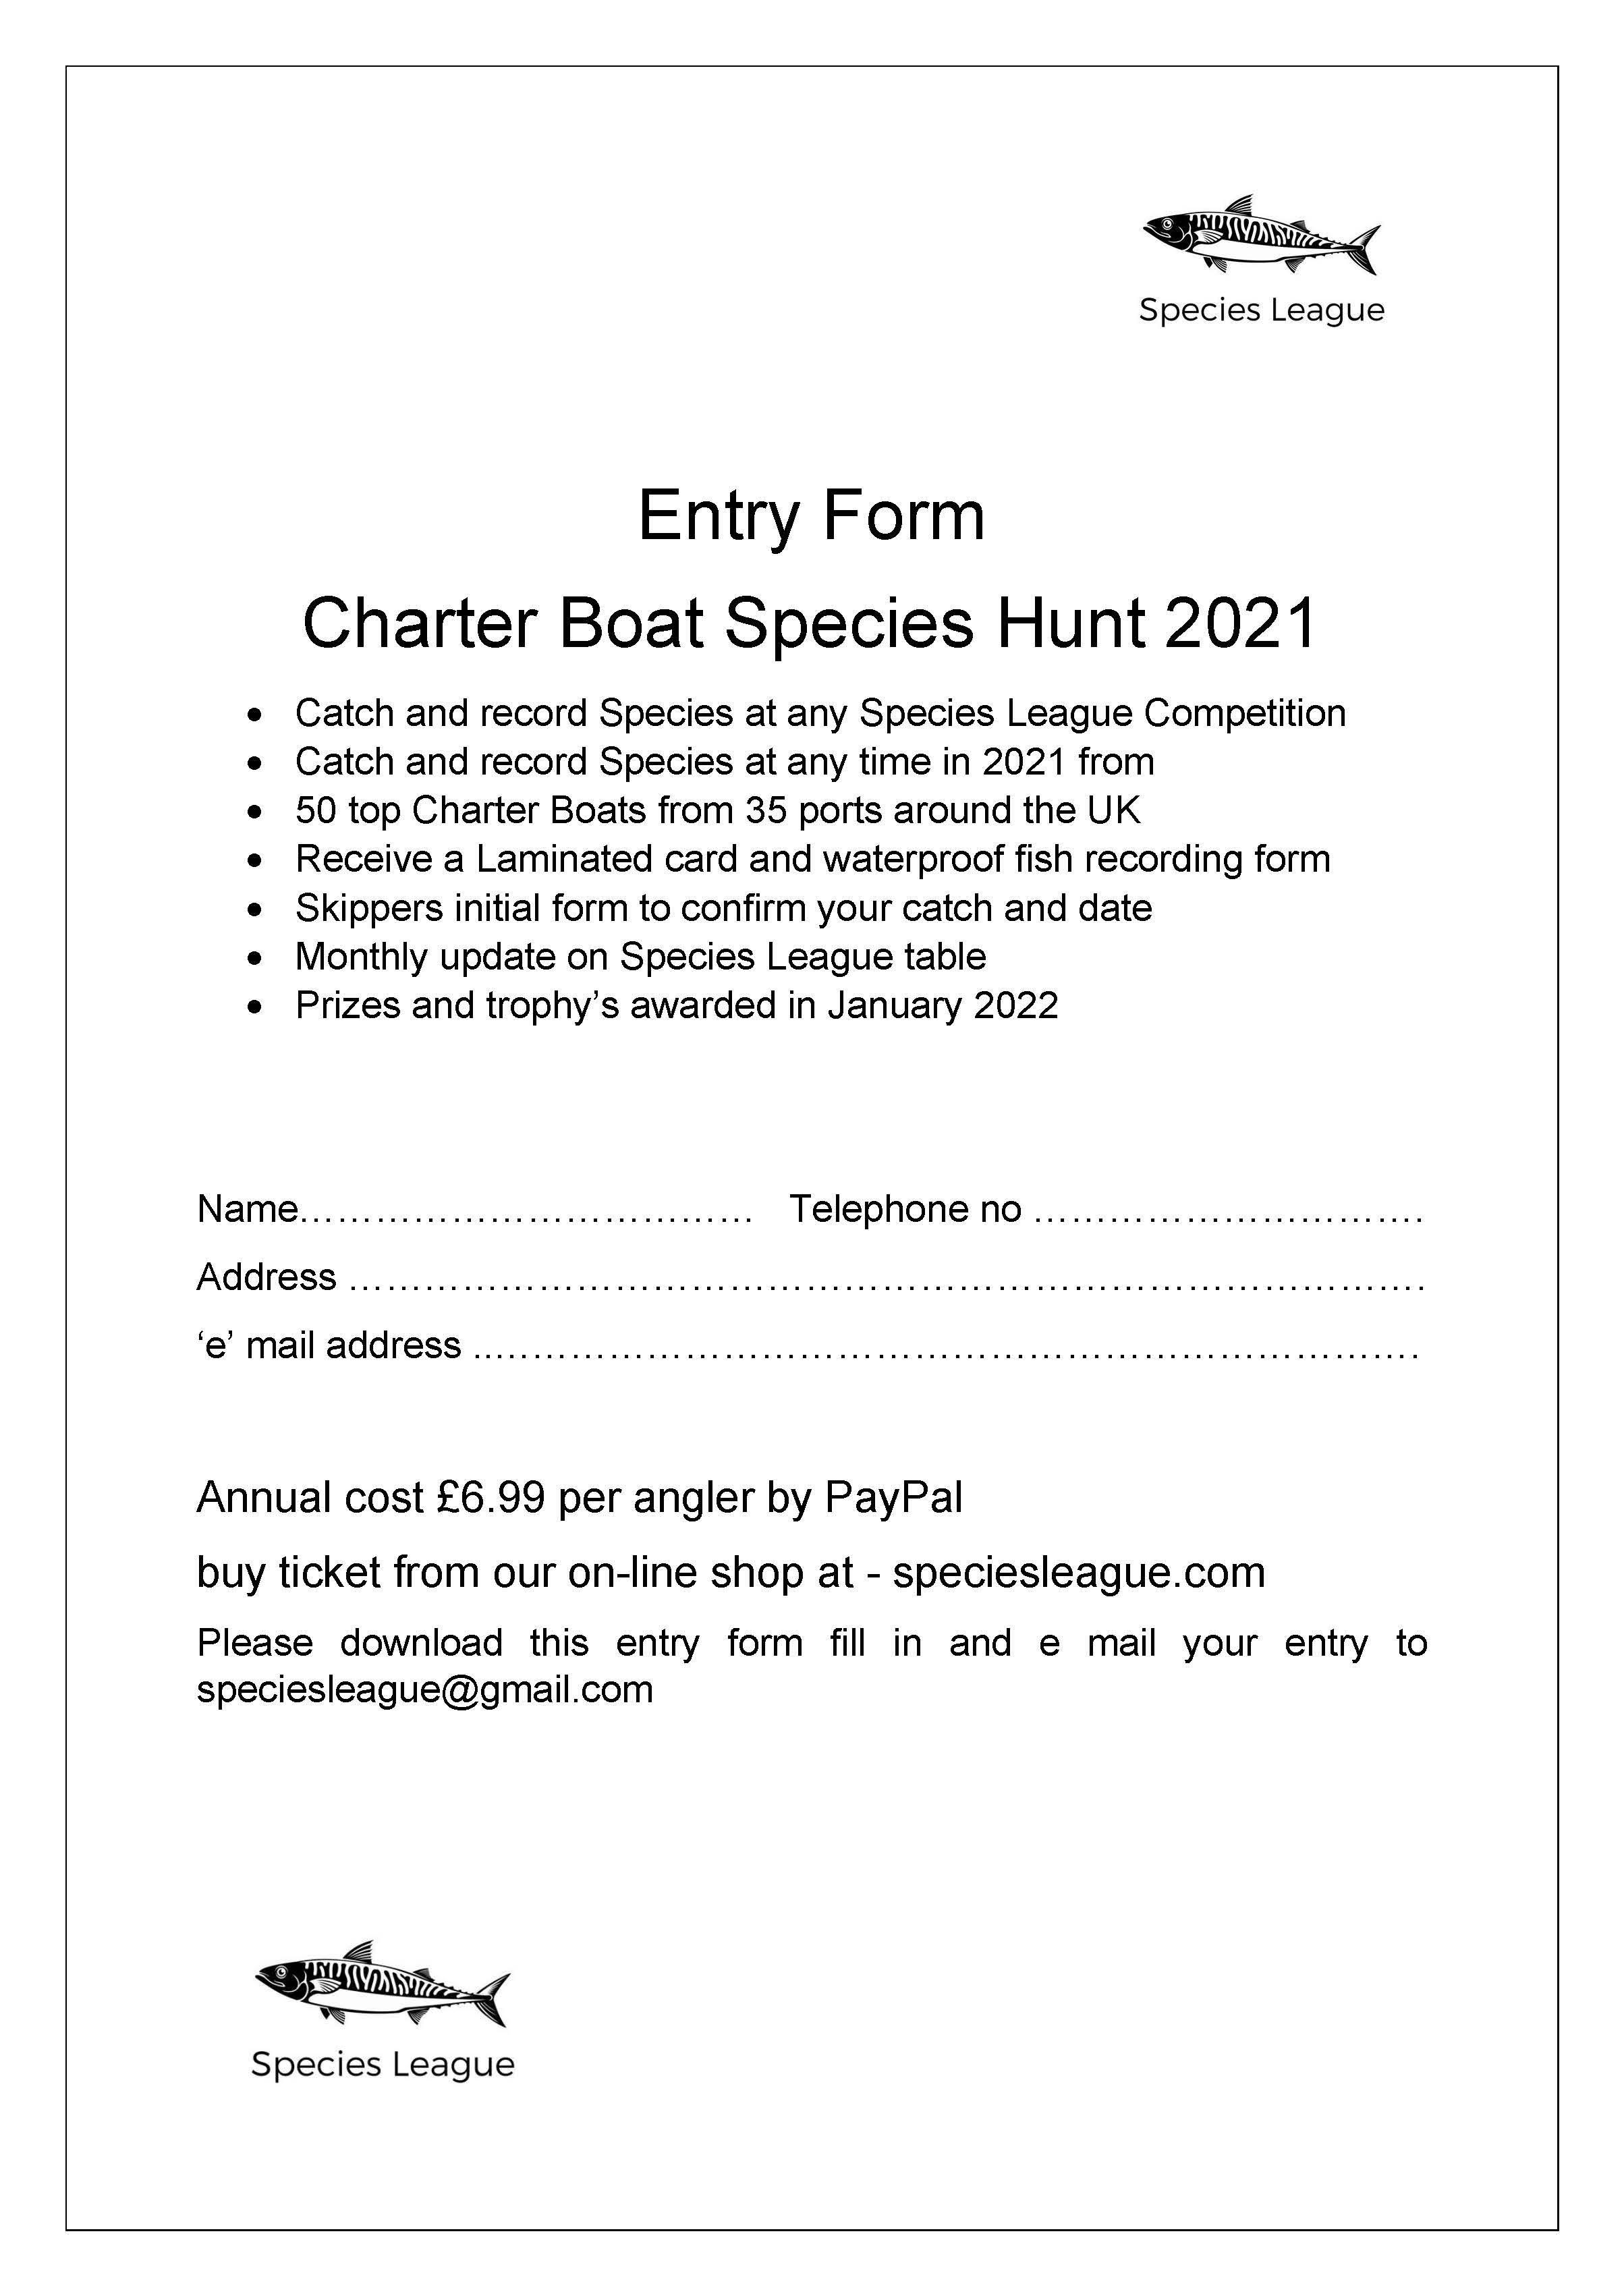 charter-boat-species-hunt-2021-entry-form-2